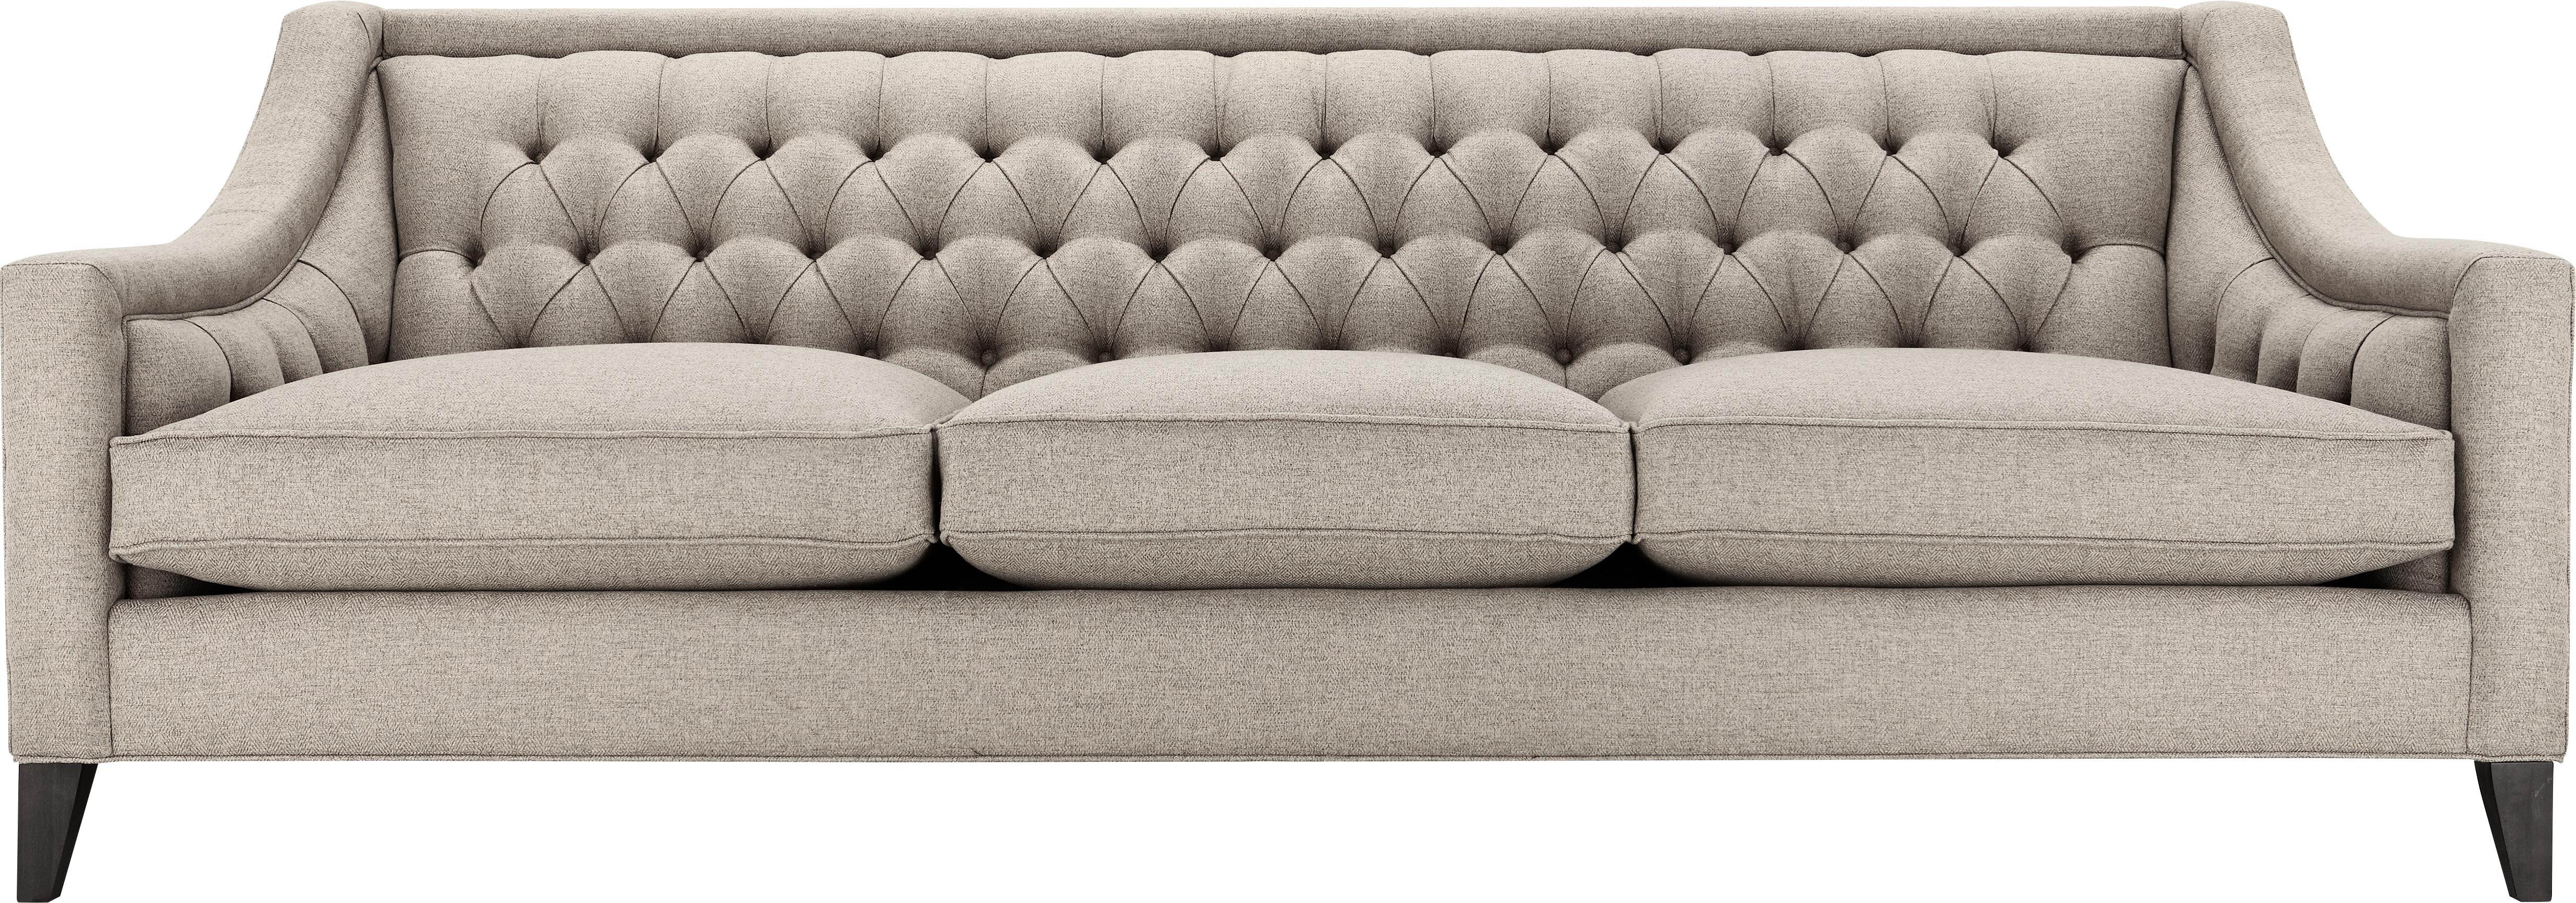 Fantastic Arhaus Lifestyle Retailer To Enter Arizona Market With Store Customarchery Wood Chair Design Ideas Customarcherynet